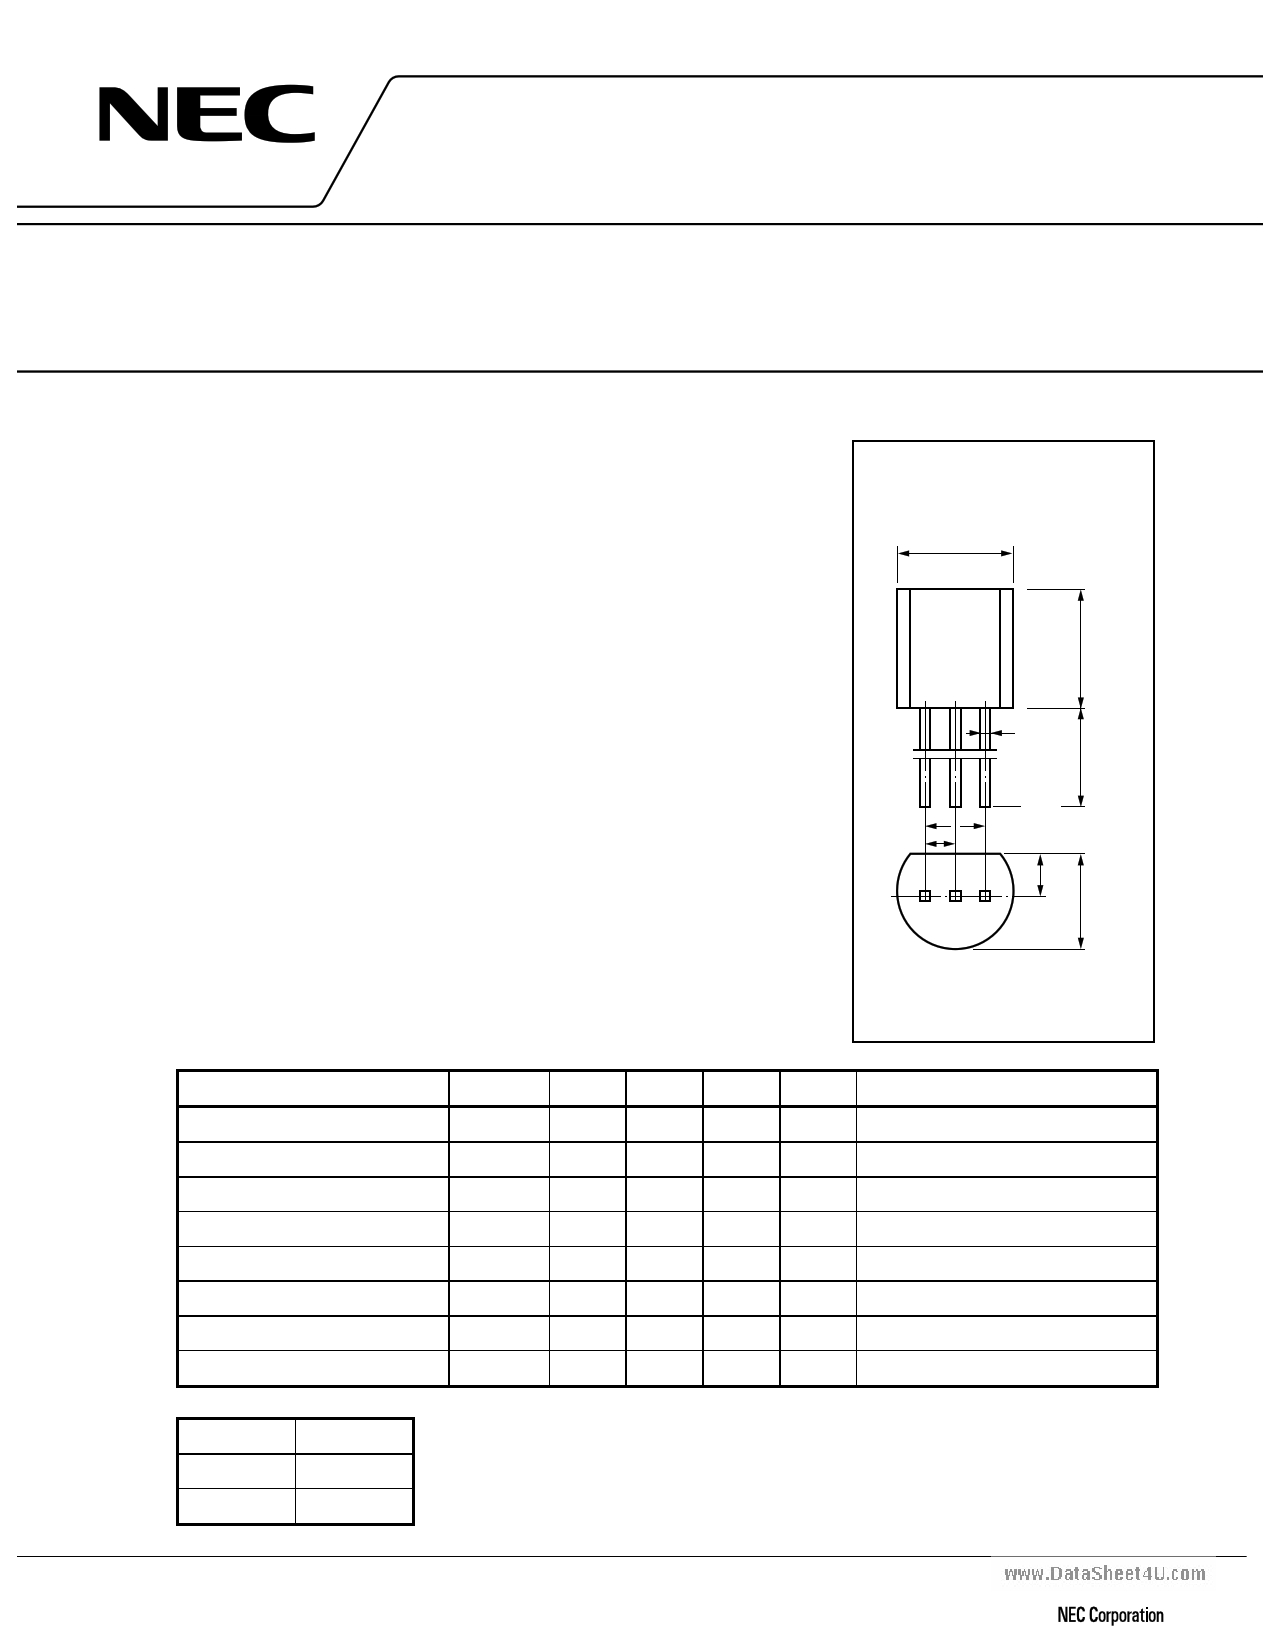 C3355 image